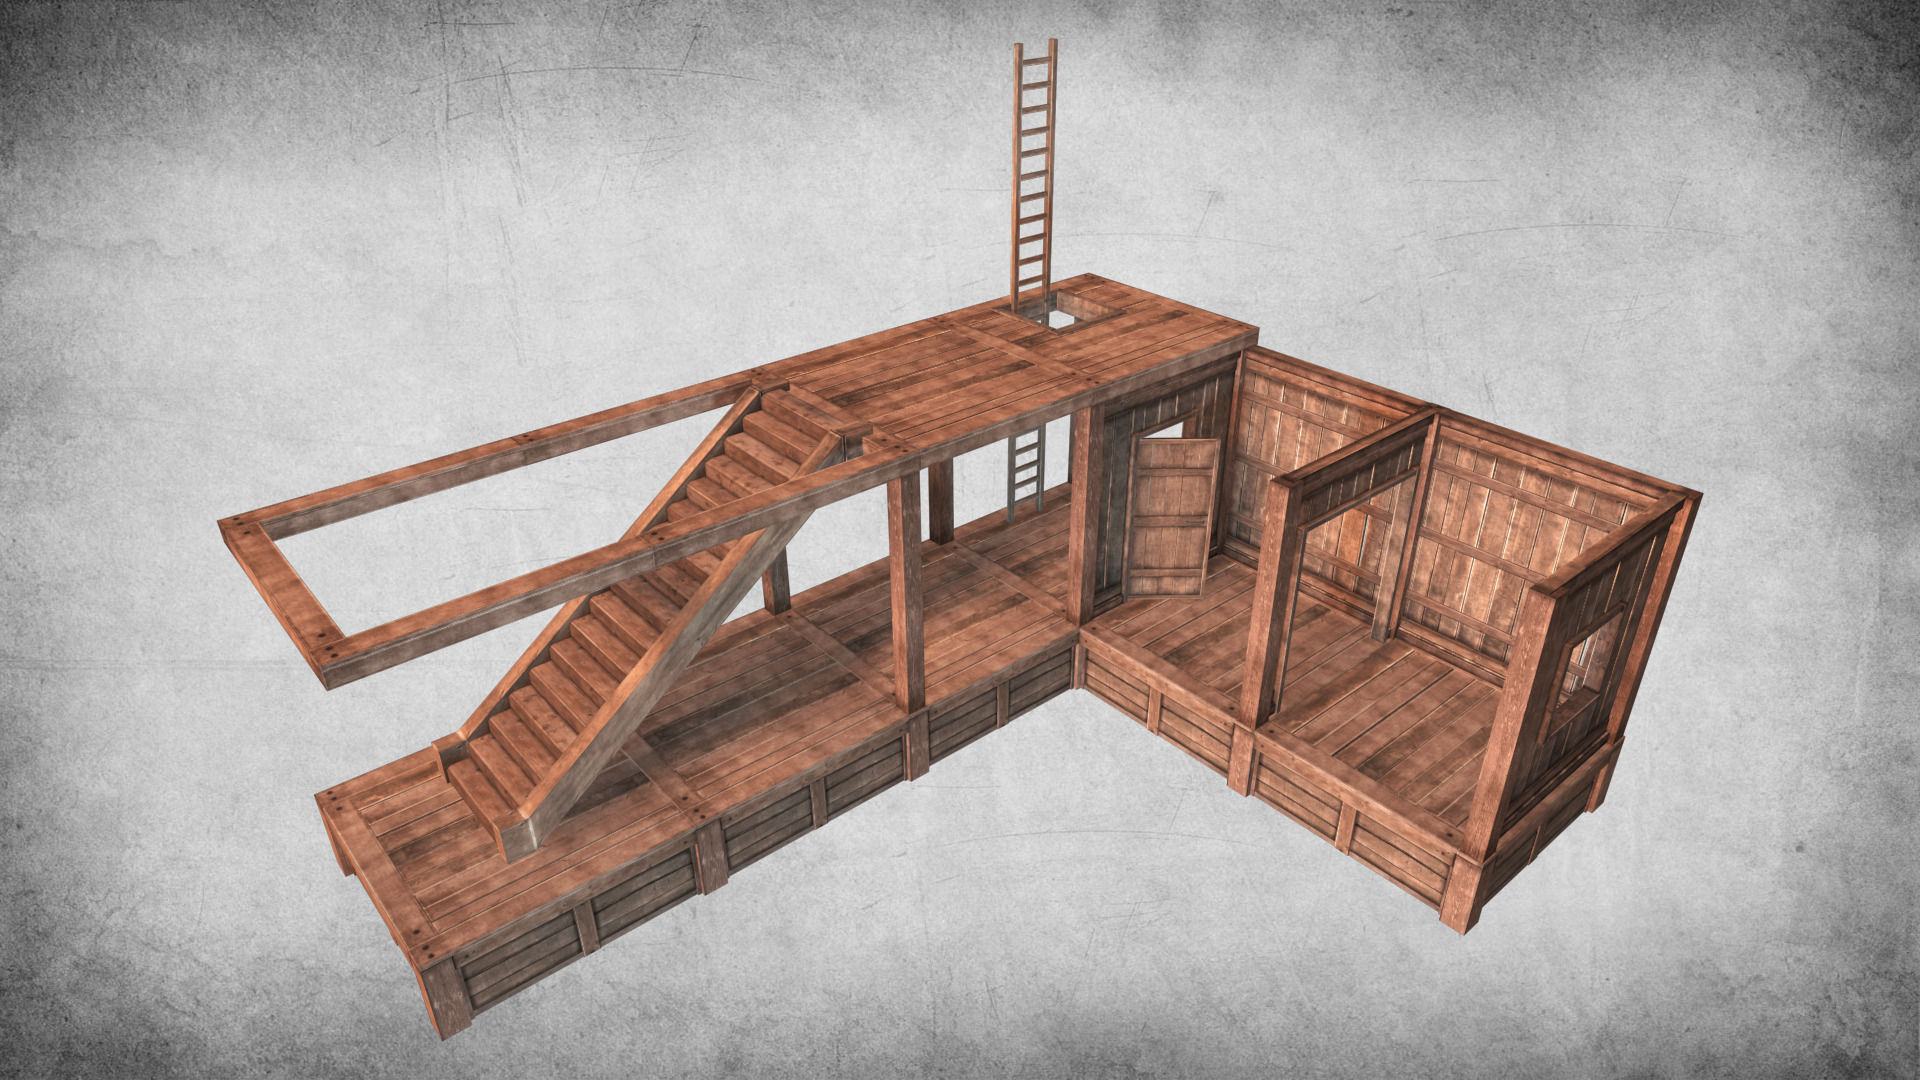 Survival Wood Crafting Kit 3D model | CGTrader